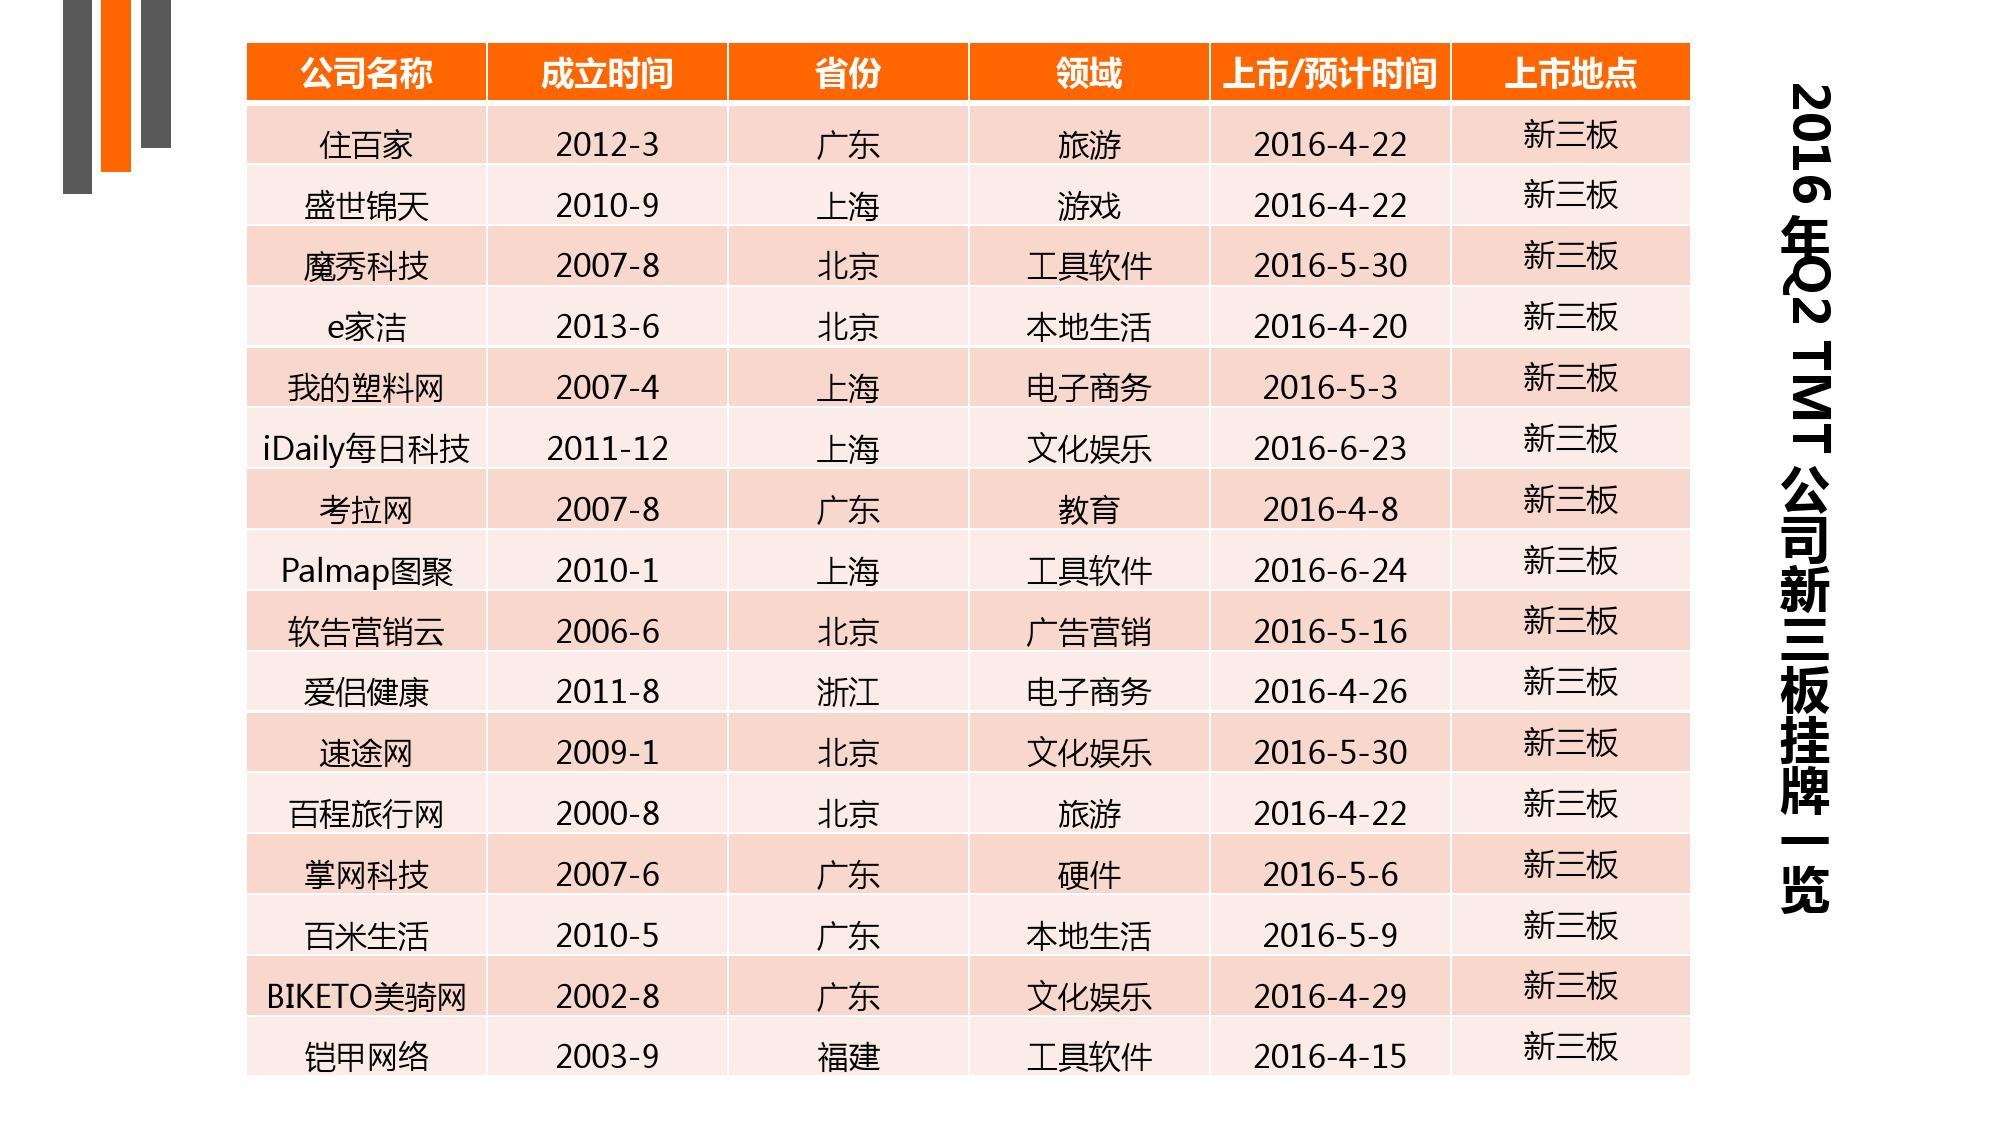 【IT桔子】2016年Q2中国互联网创业投资分析报告_000025